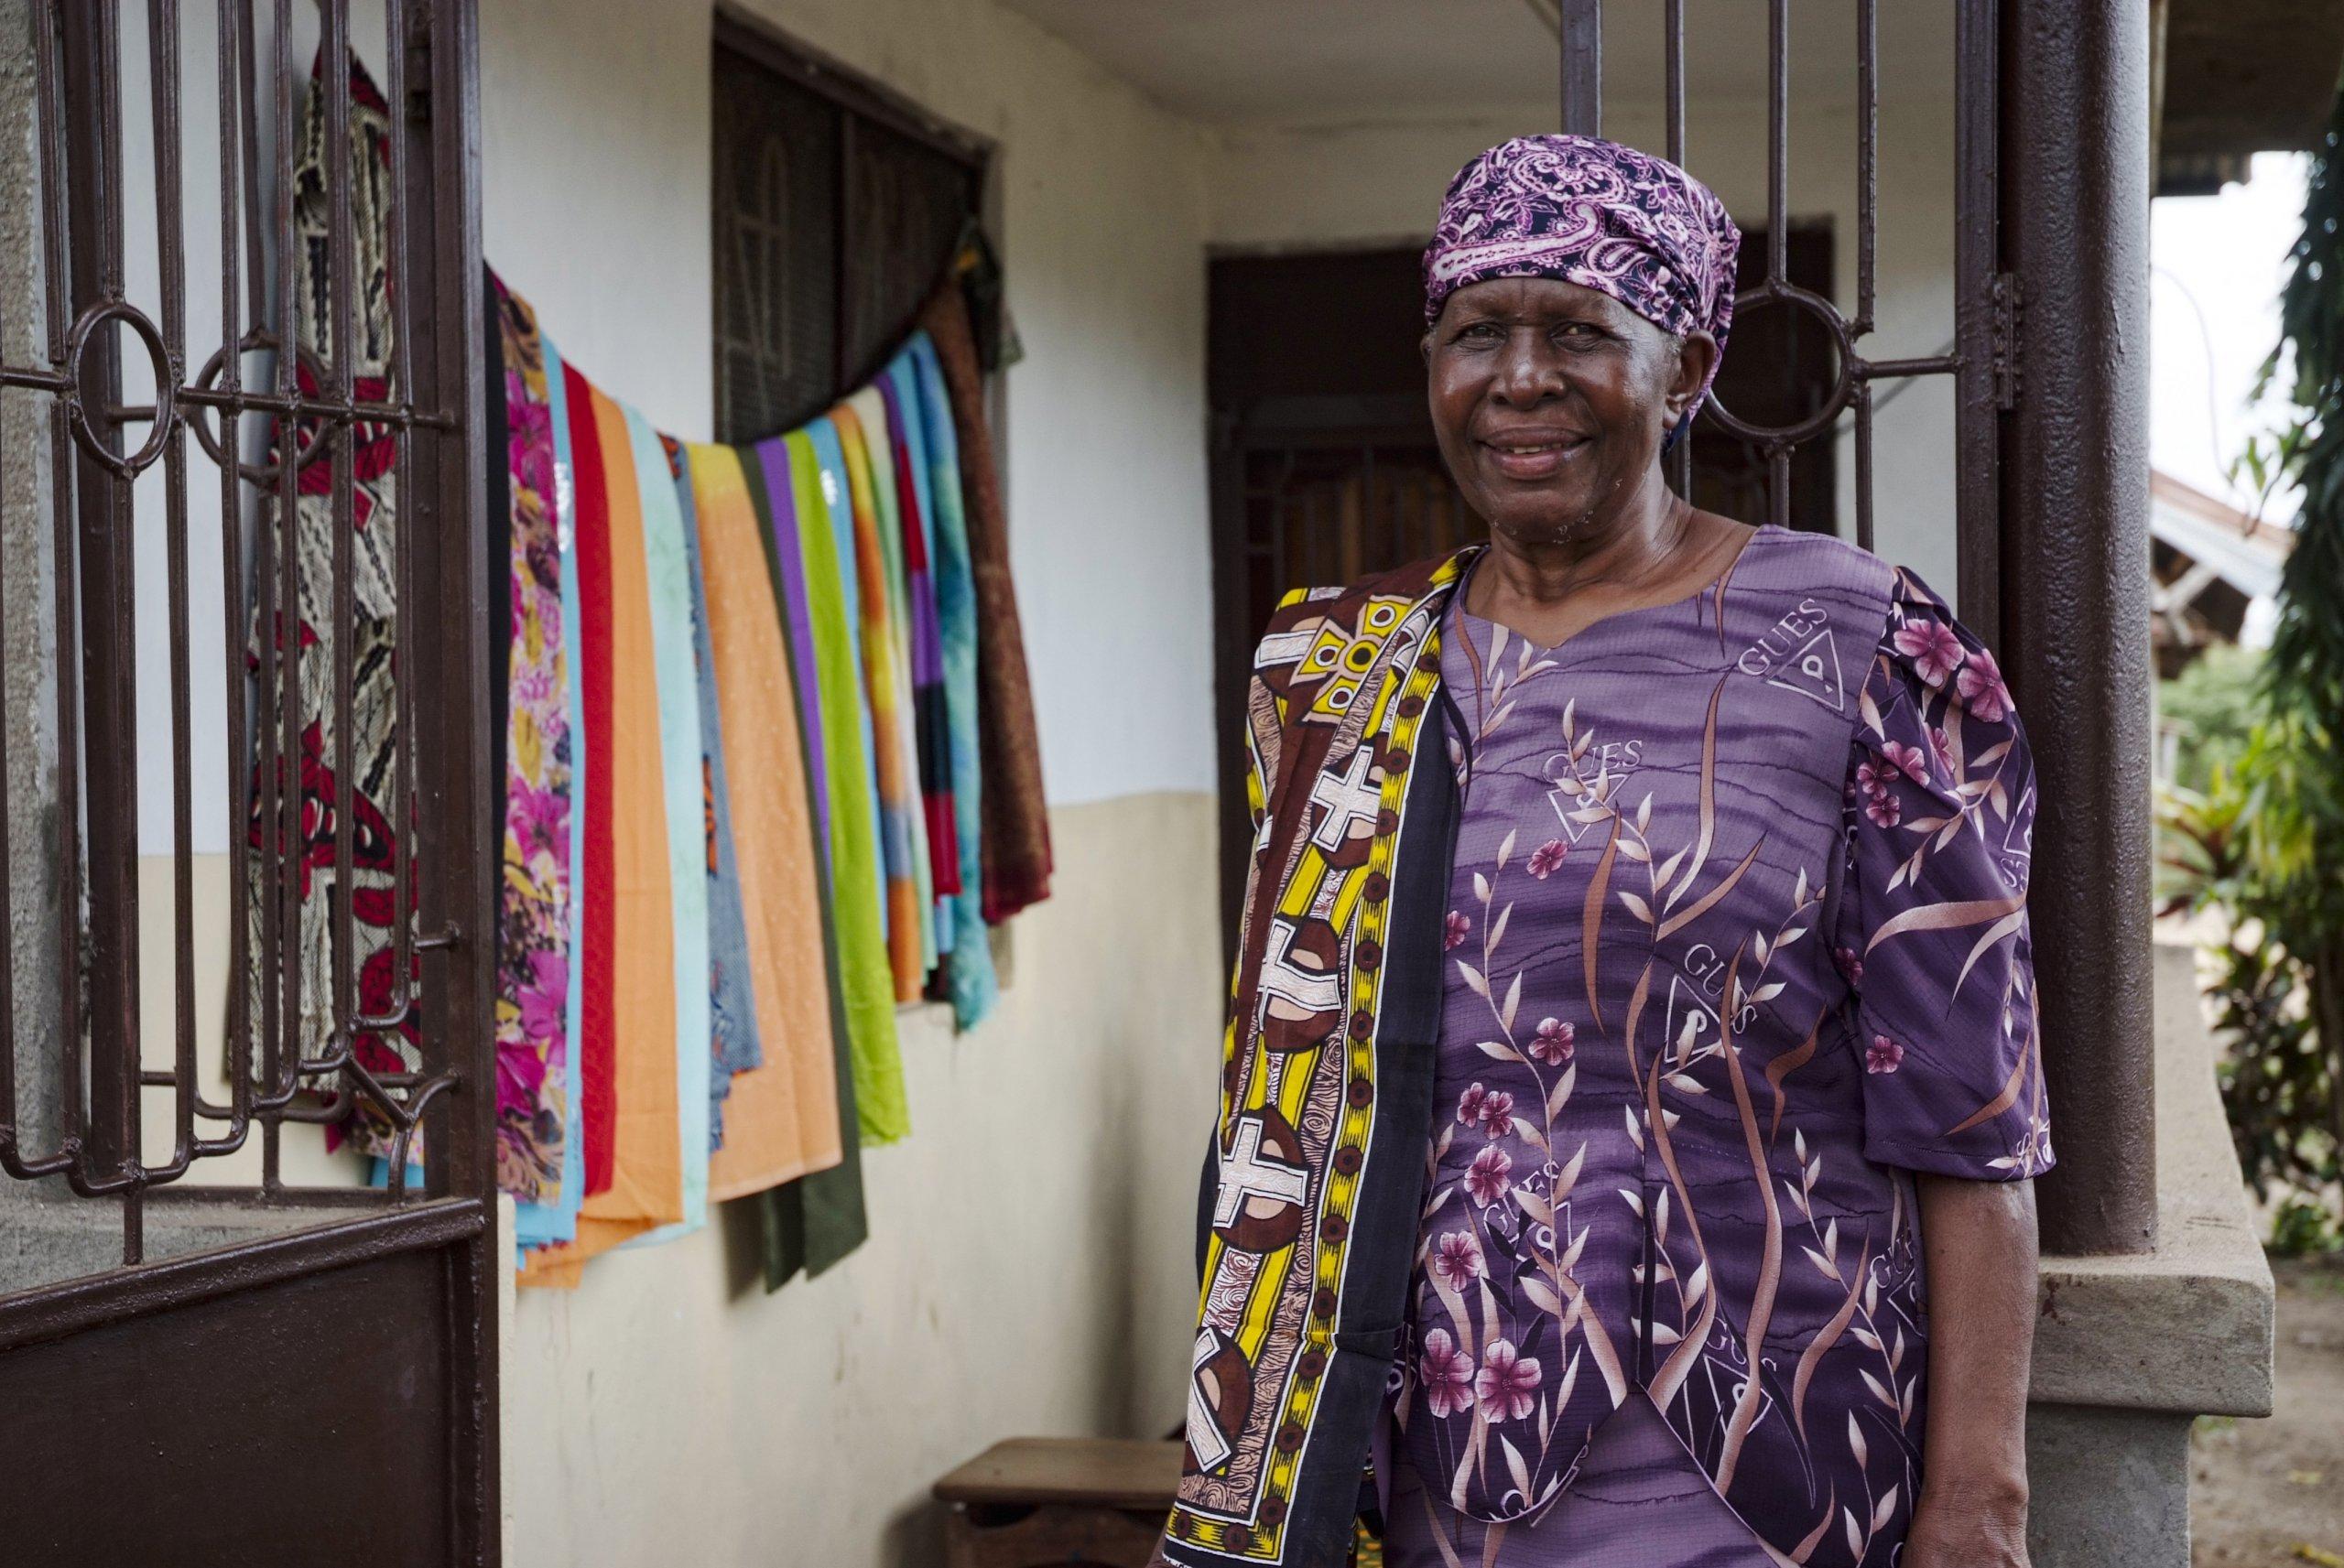 21 01 boerin trotsevrouw Joyce Anne Kibaja Korogwe Tanzania 4897 scaled